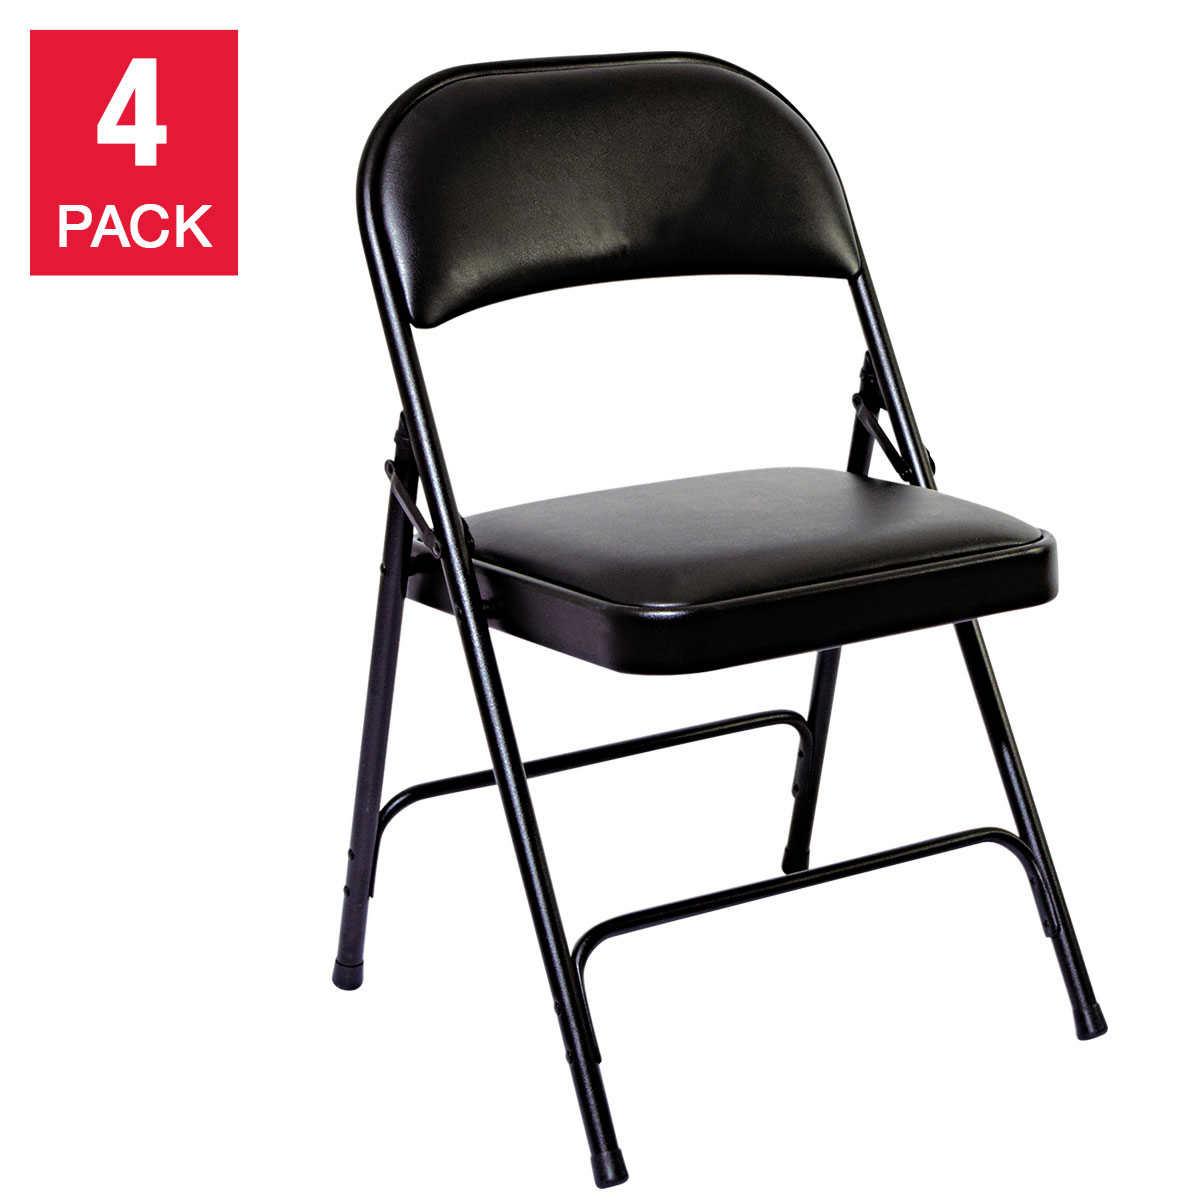 Alera Steel Folding Chair W Padded Seat Graphite 4 Pack